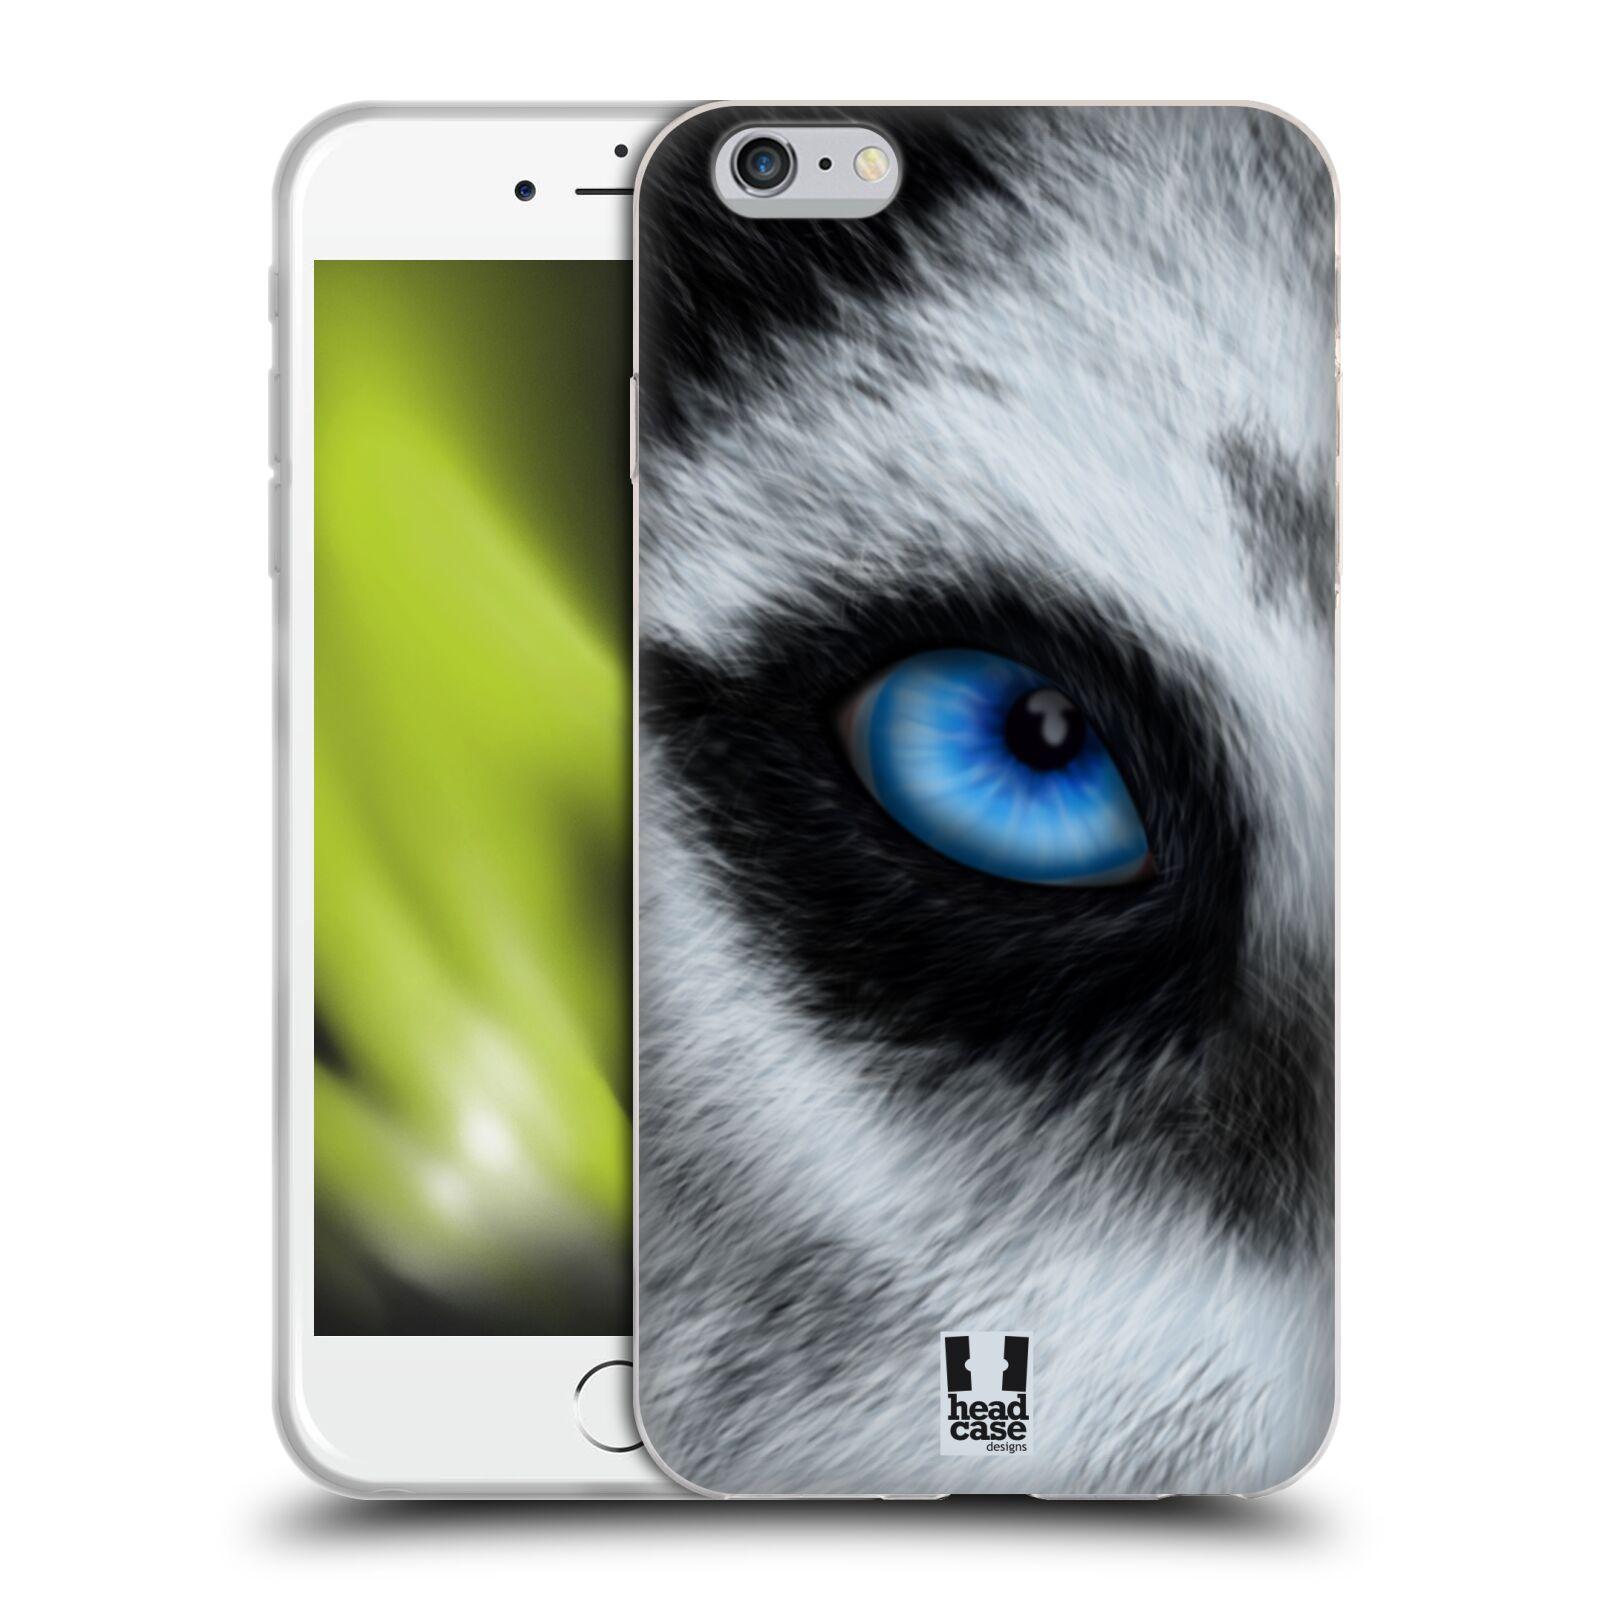 HEAD CASE silikonový obal na mobil Apple Iphone 6 PLUS/ 6S PLUS vzor pohled zvířete oko pes husky